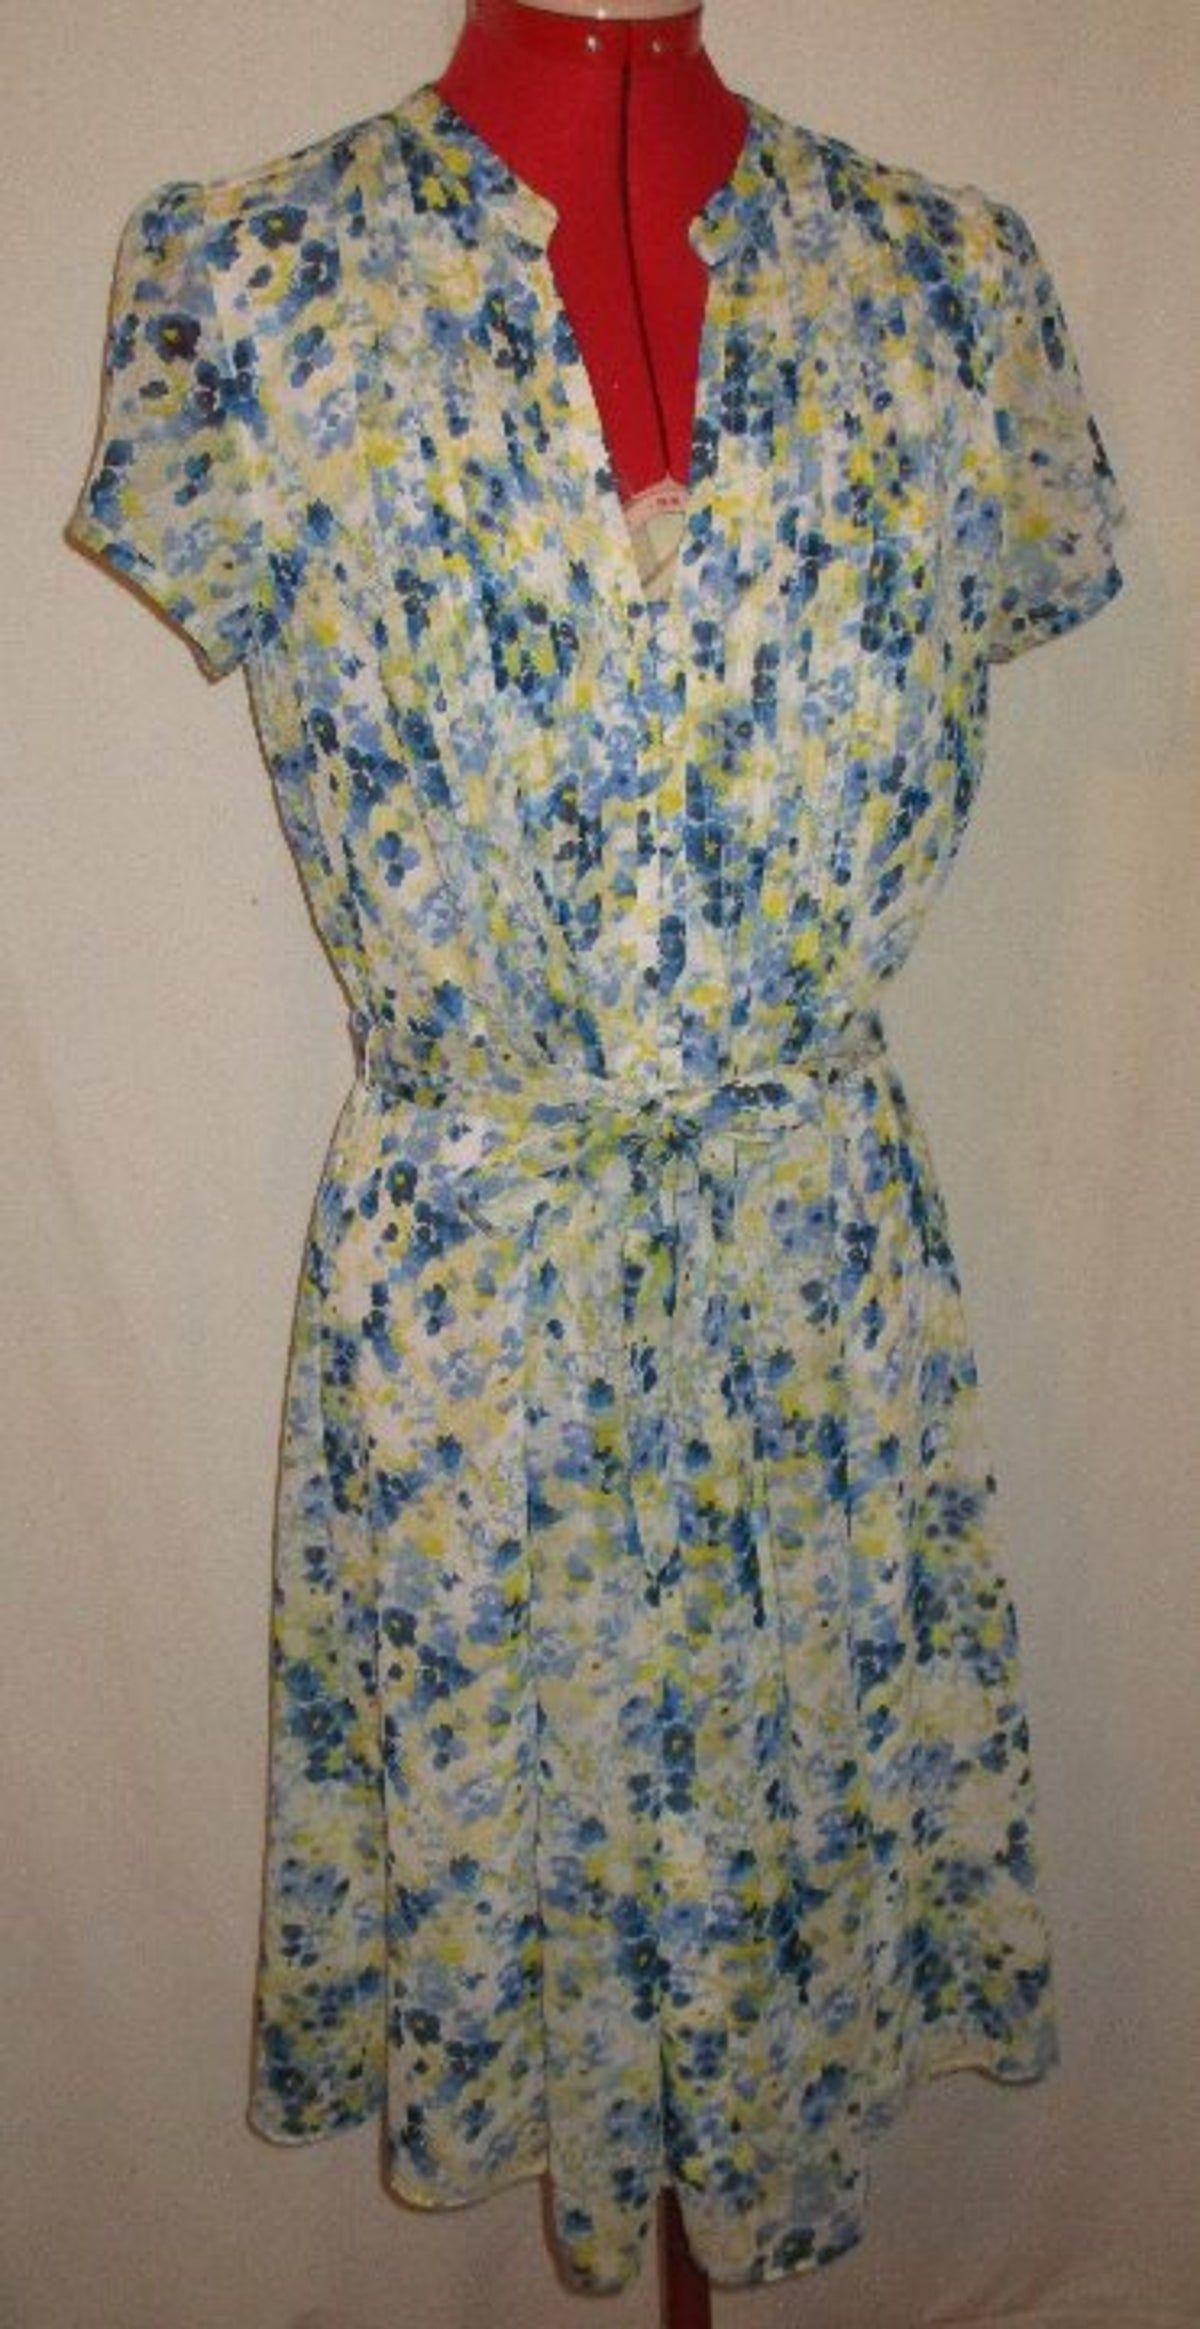 Jbs Yel Blu S/S Dress Sz 10, Ln